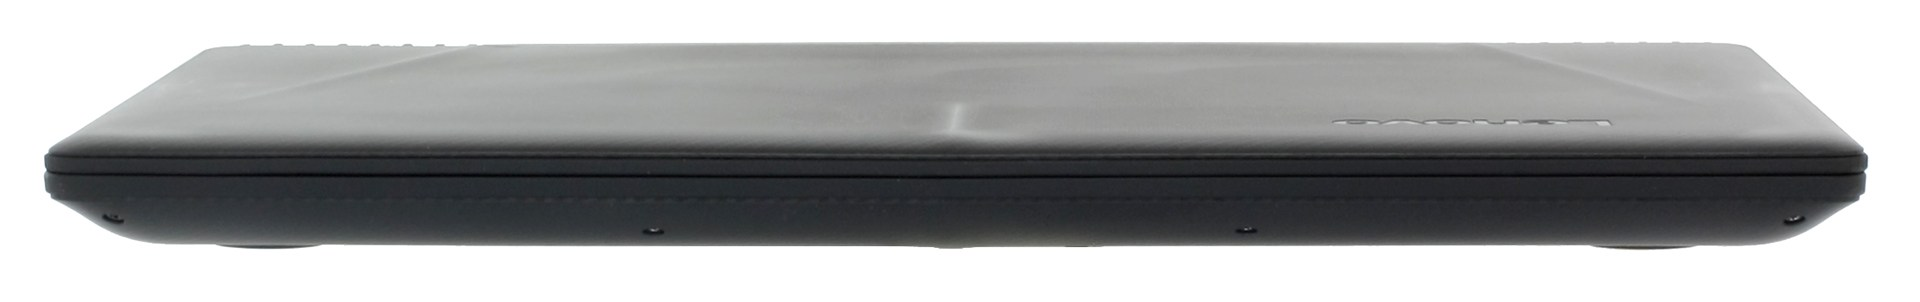 review Lenovo Legion Y520 (GTX 1050 Ti) 600 08